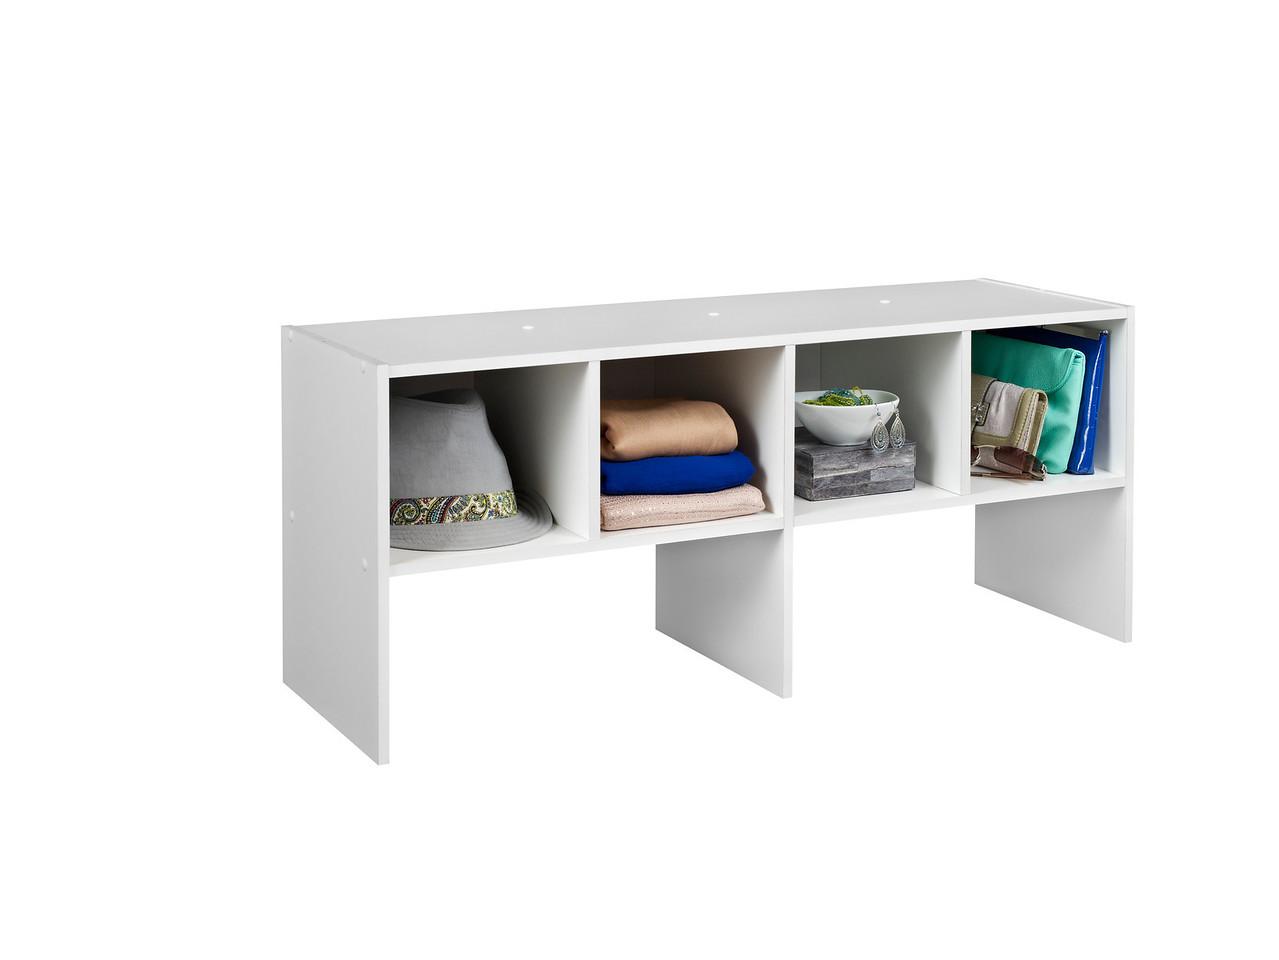 ClosetMaid Shelf Organizer in White.